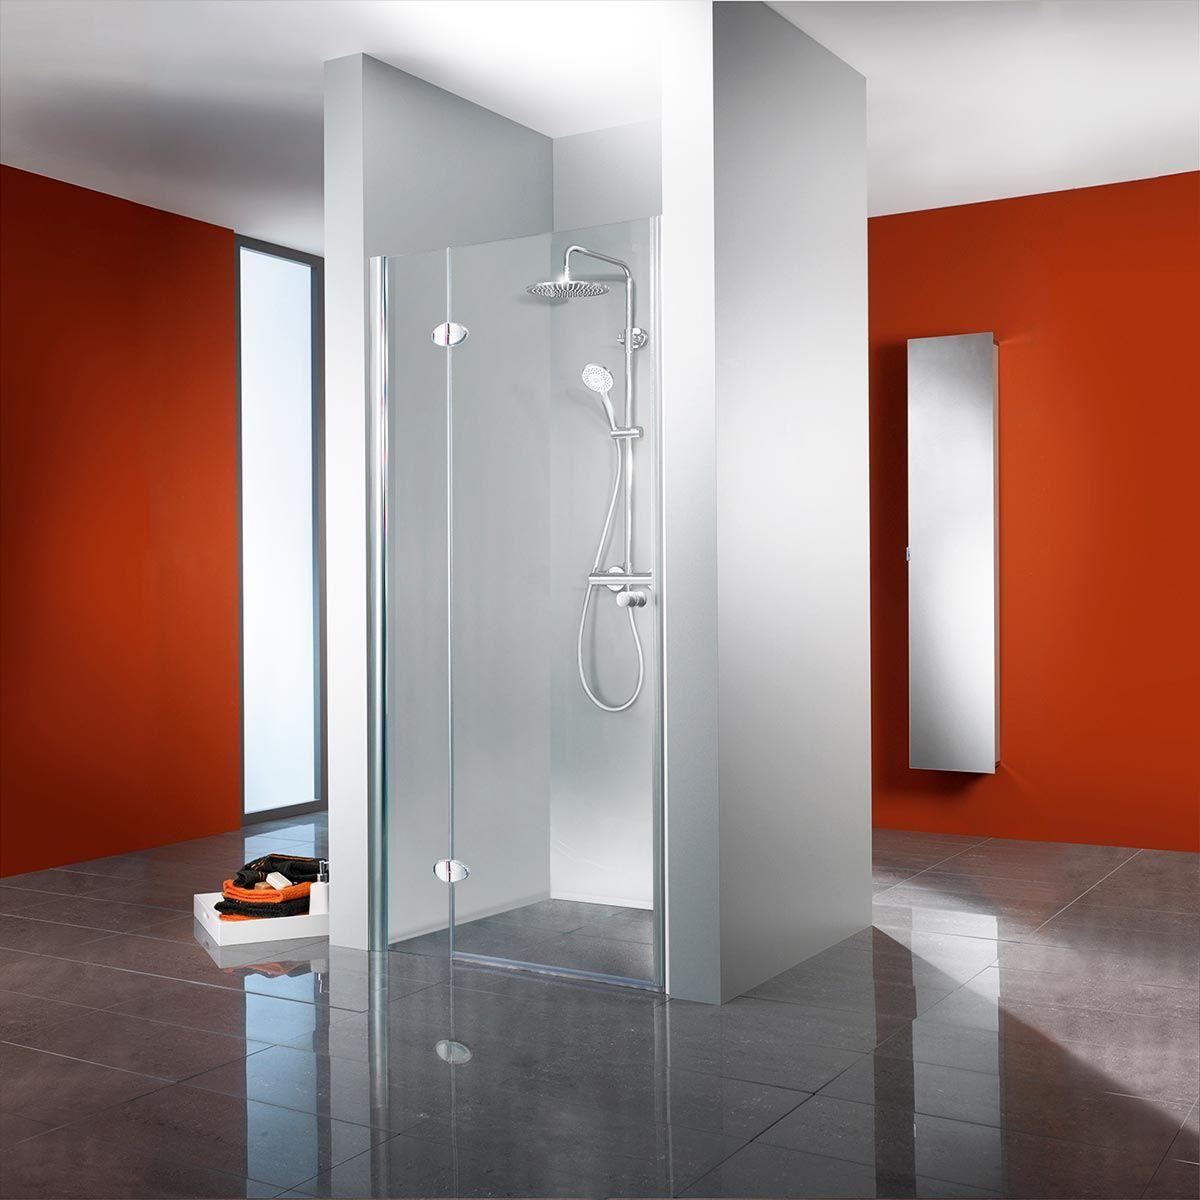 Duschtur Nische 28 Ideen Fur Gemutliche Nischenduschen Dusche Duschtur Duschideen